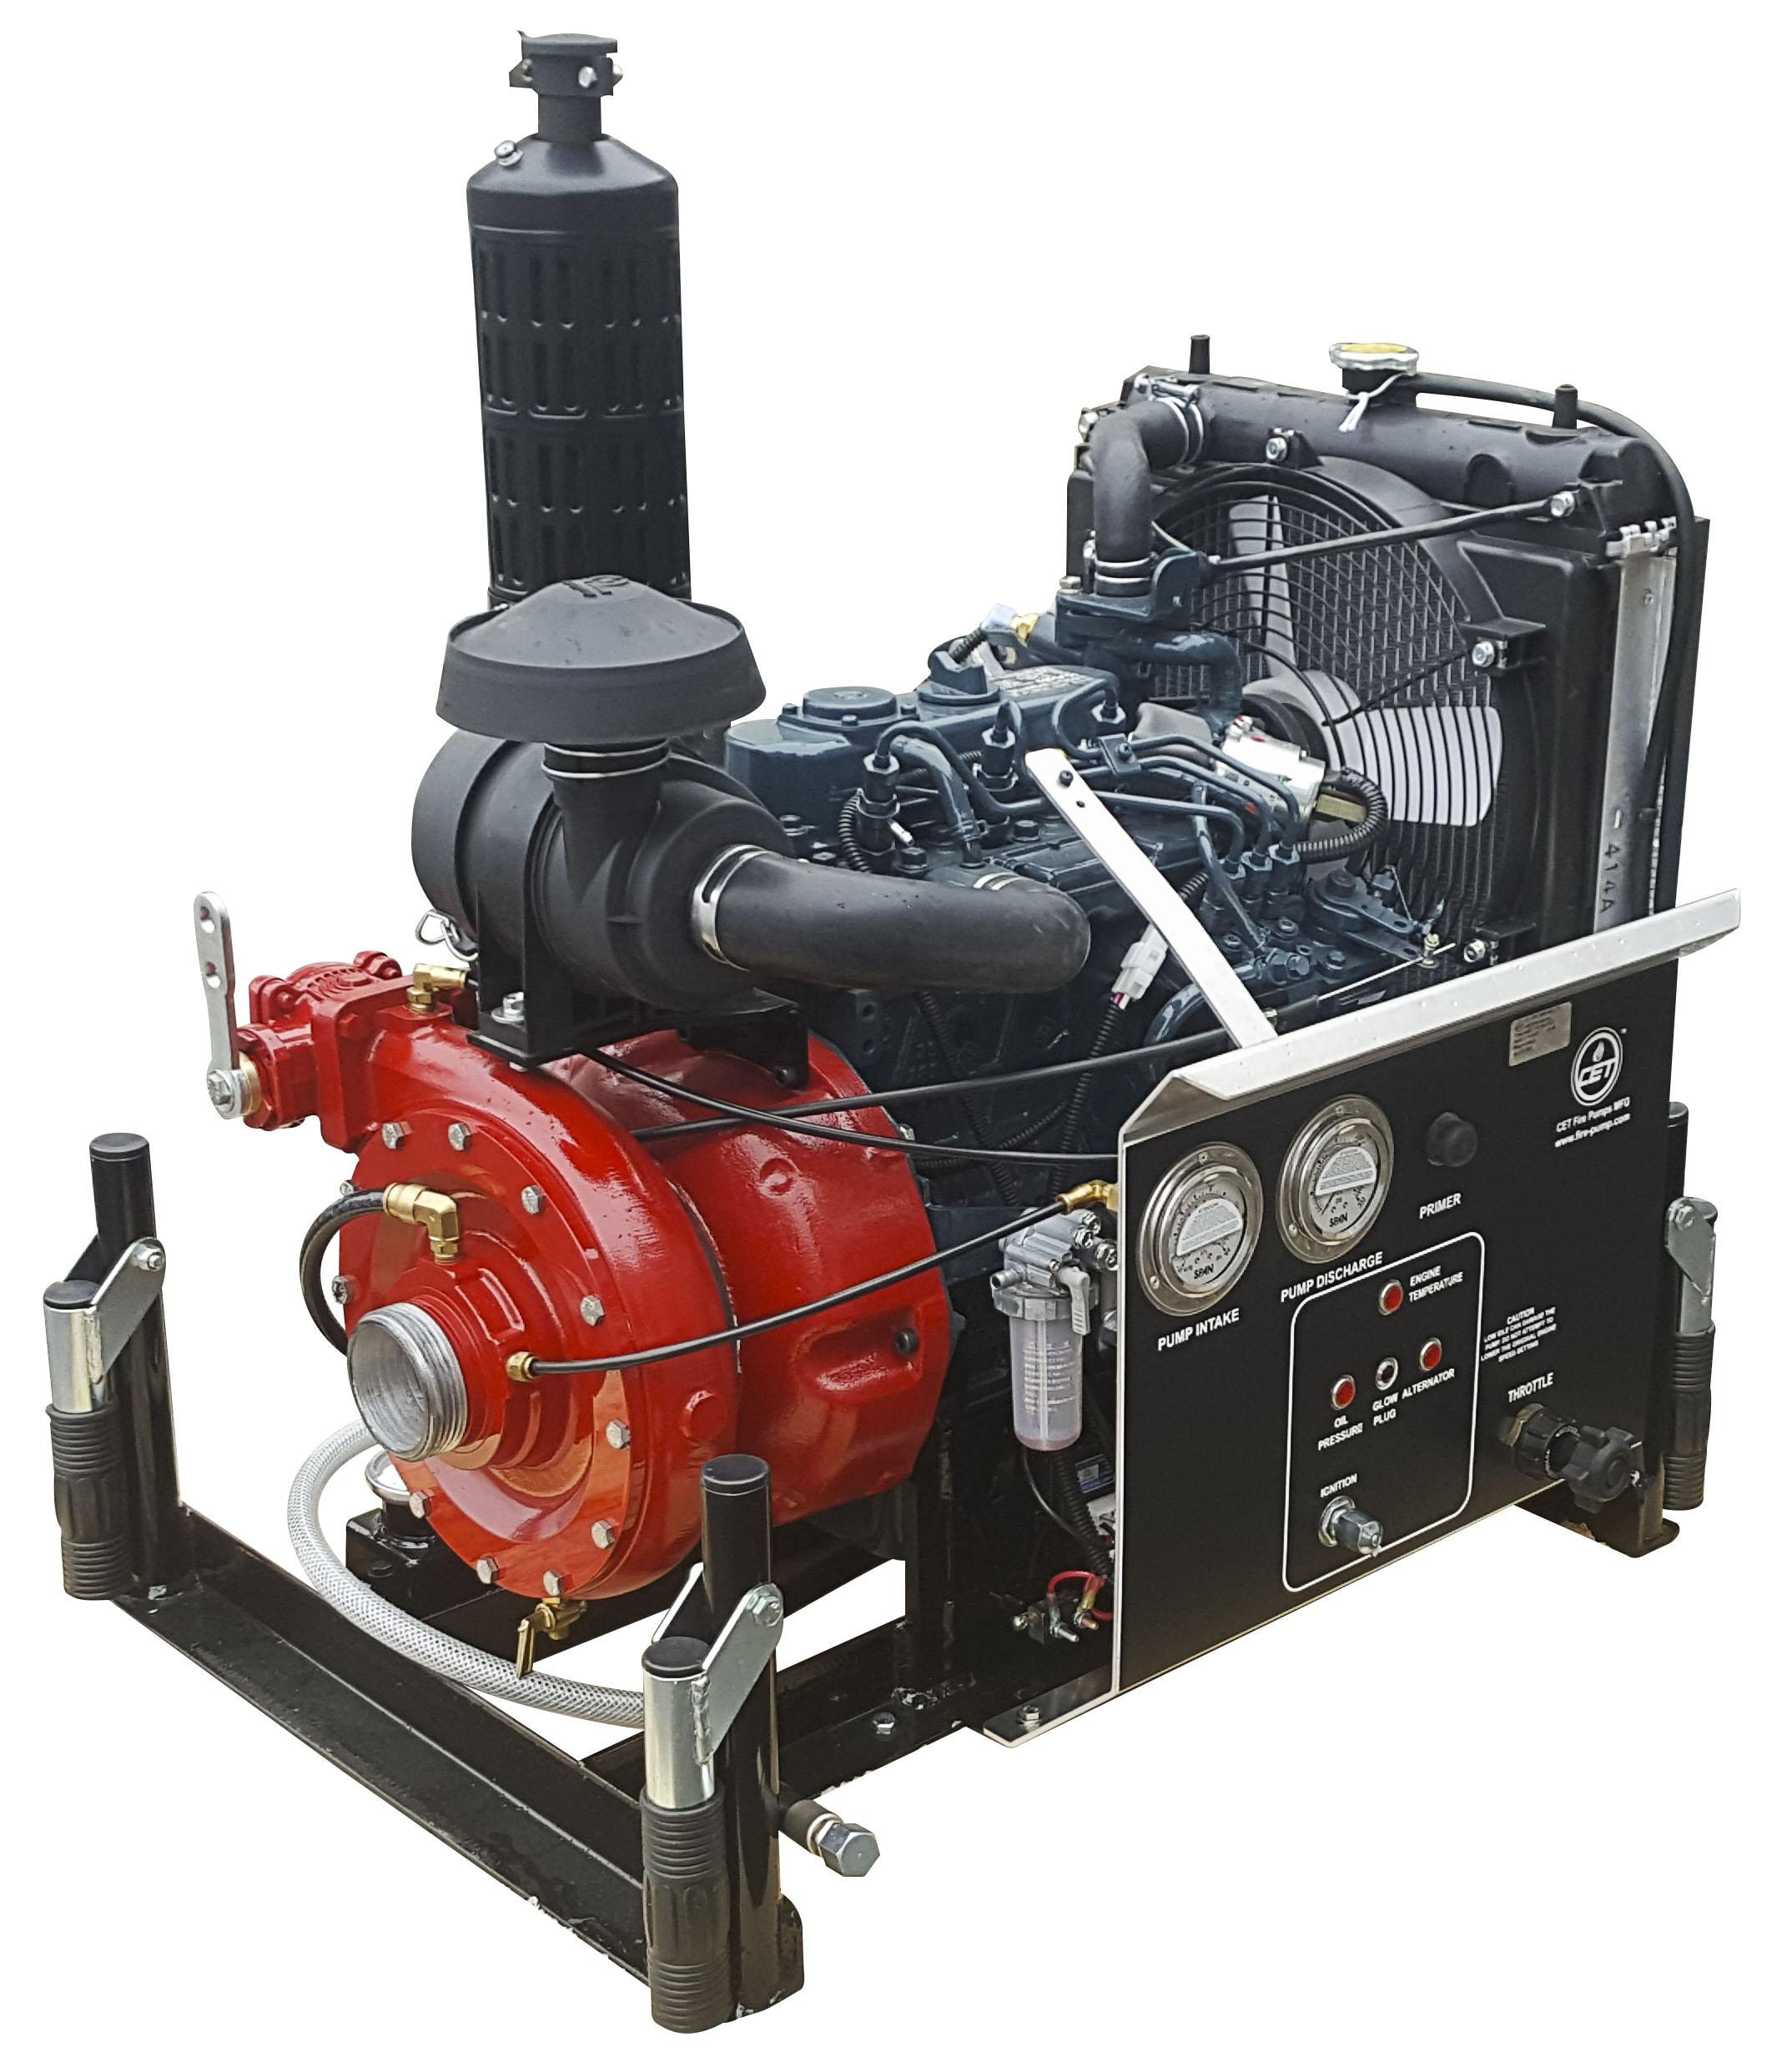 CET Fire Pumps High Pressure Pump - PFP-25HP-DSL-MR | Absolute Water